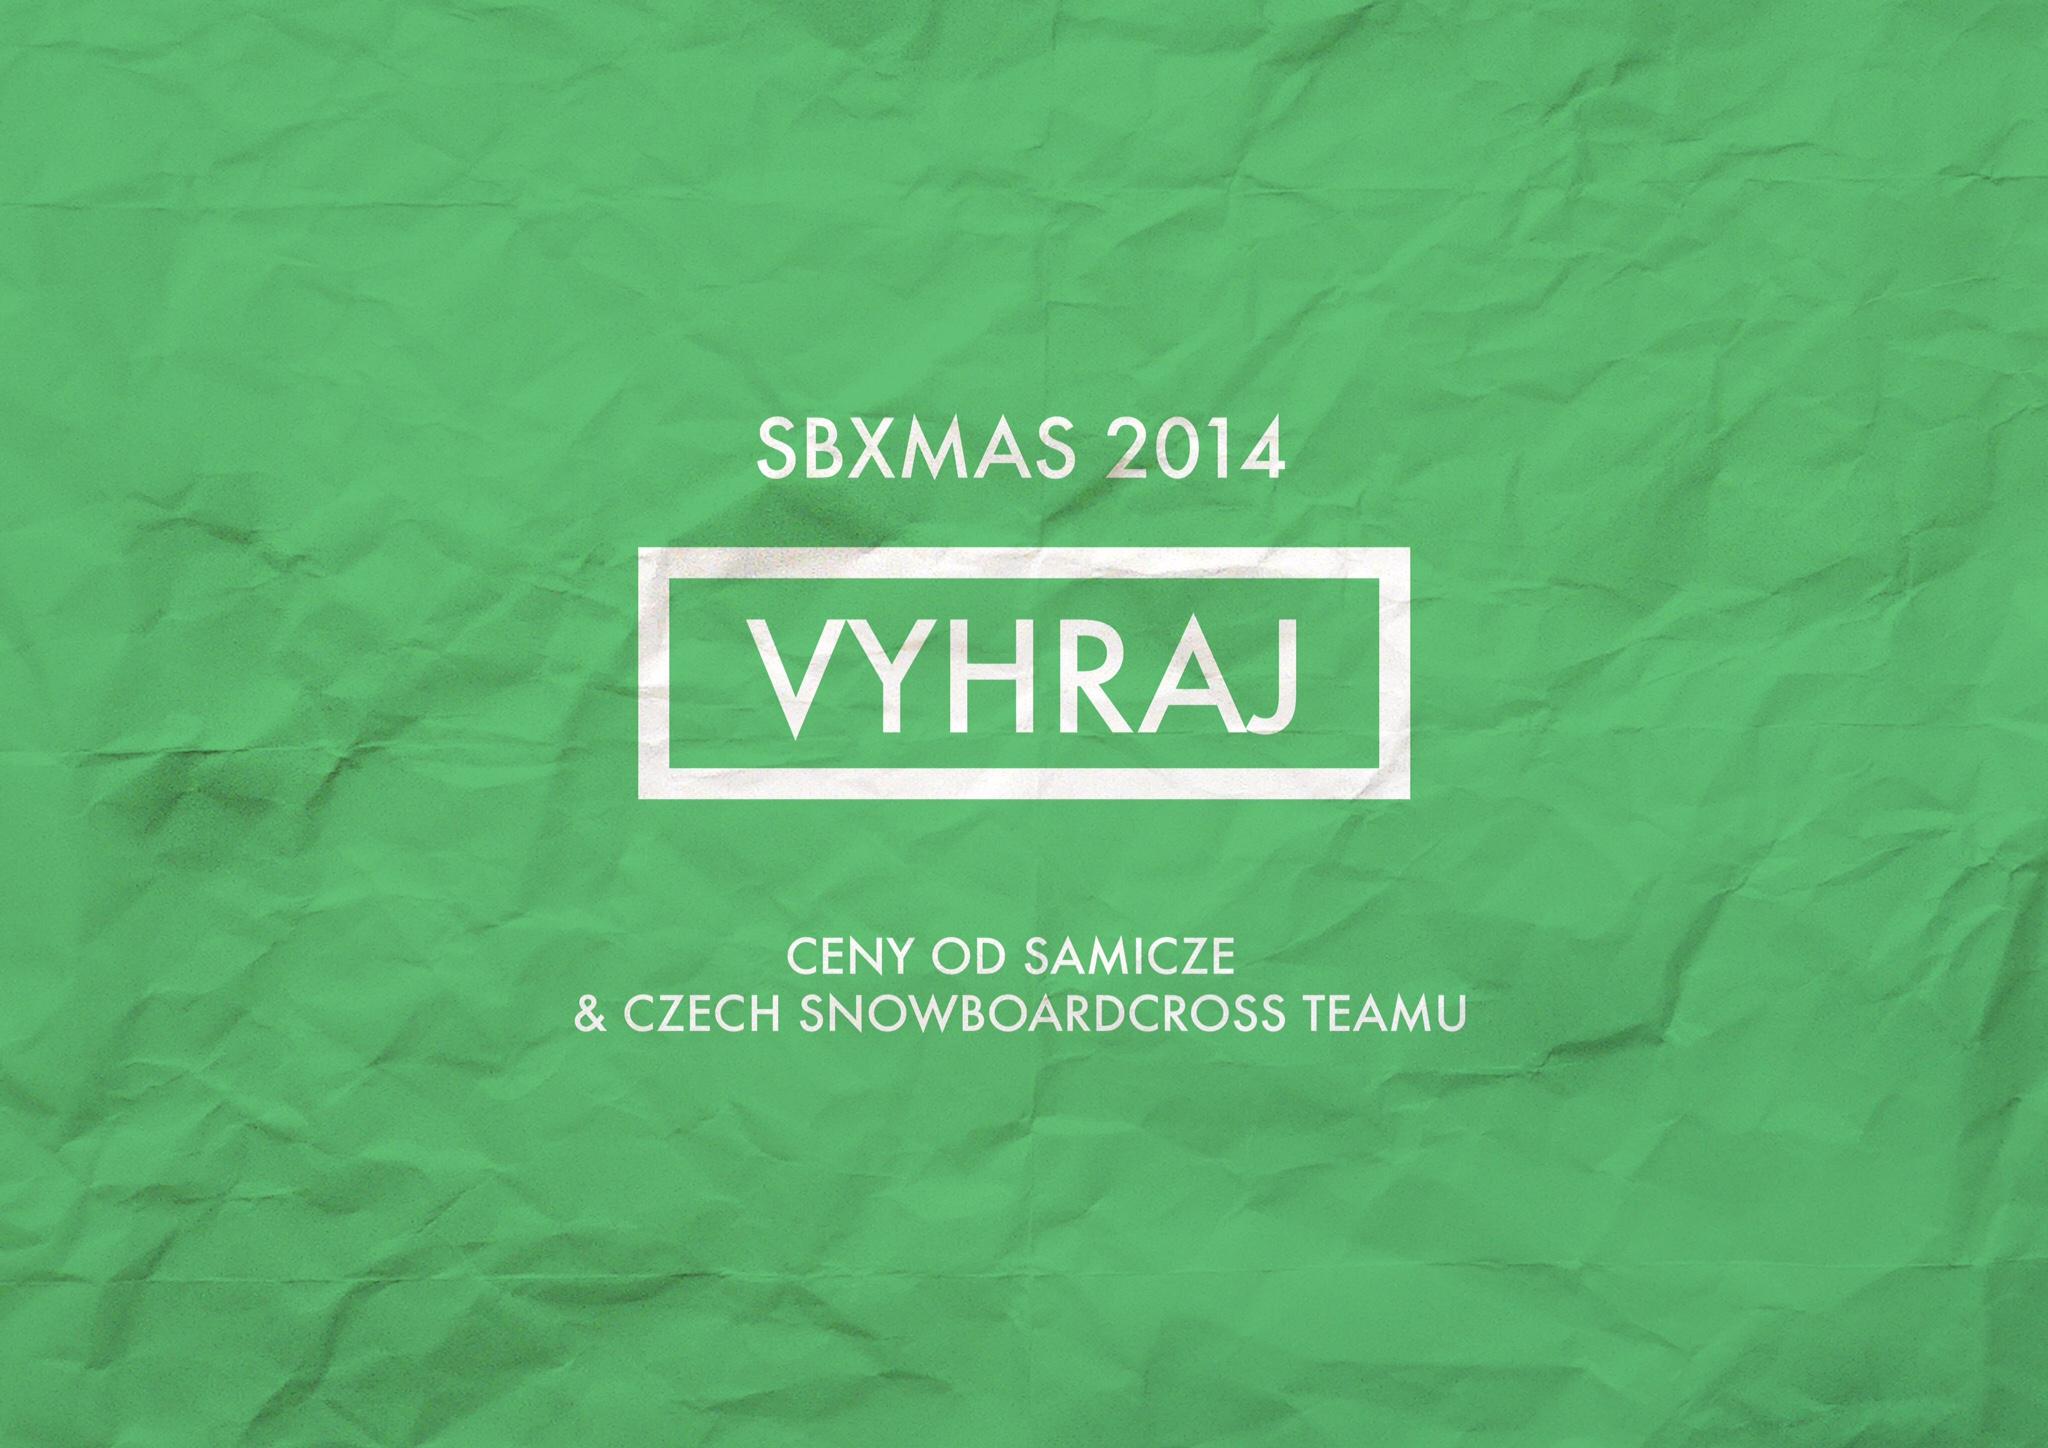 sbxmas2014